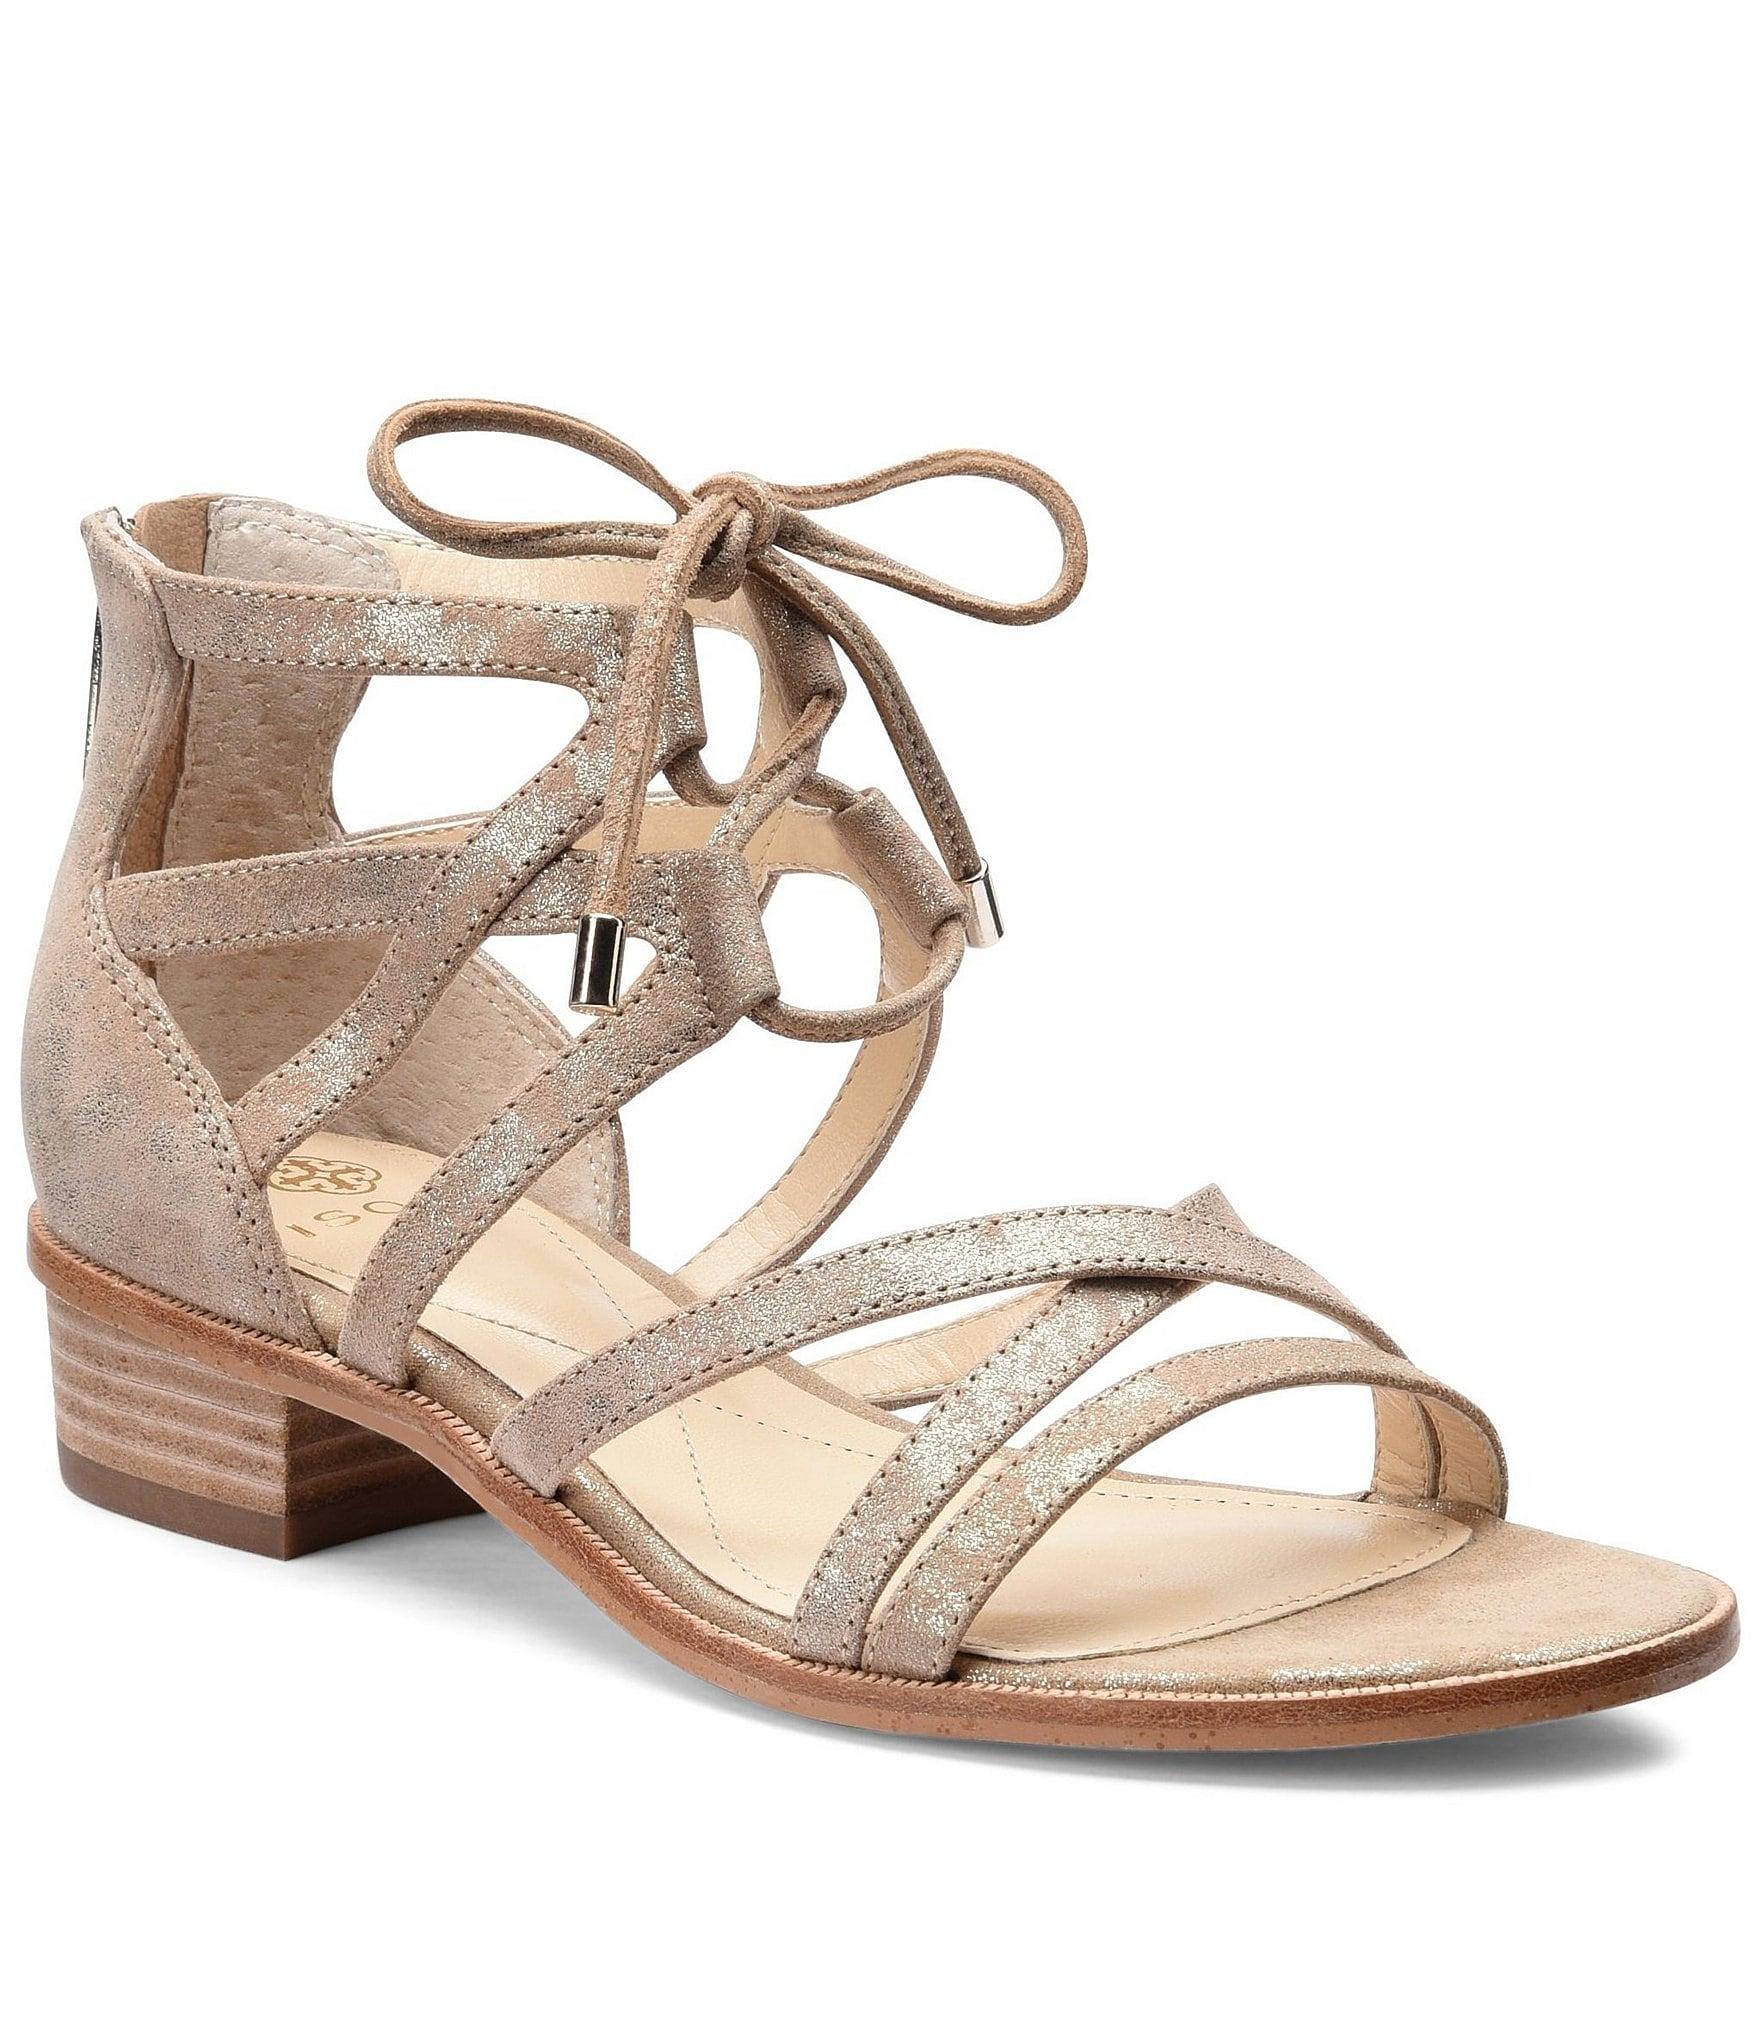 Dillards Shoes Womens Sandals